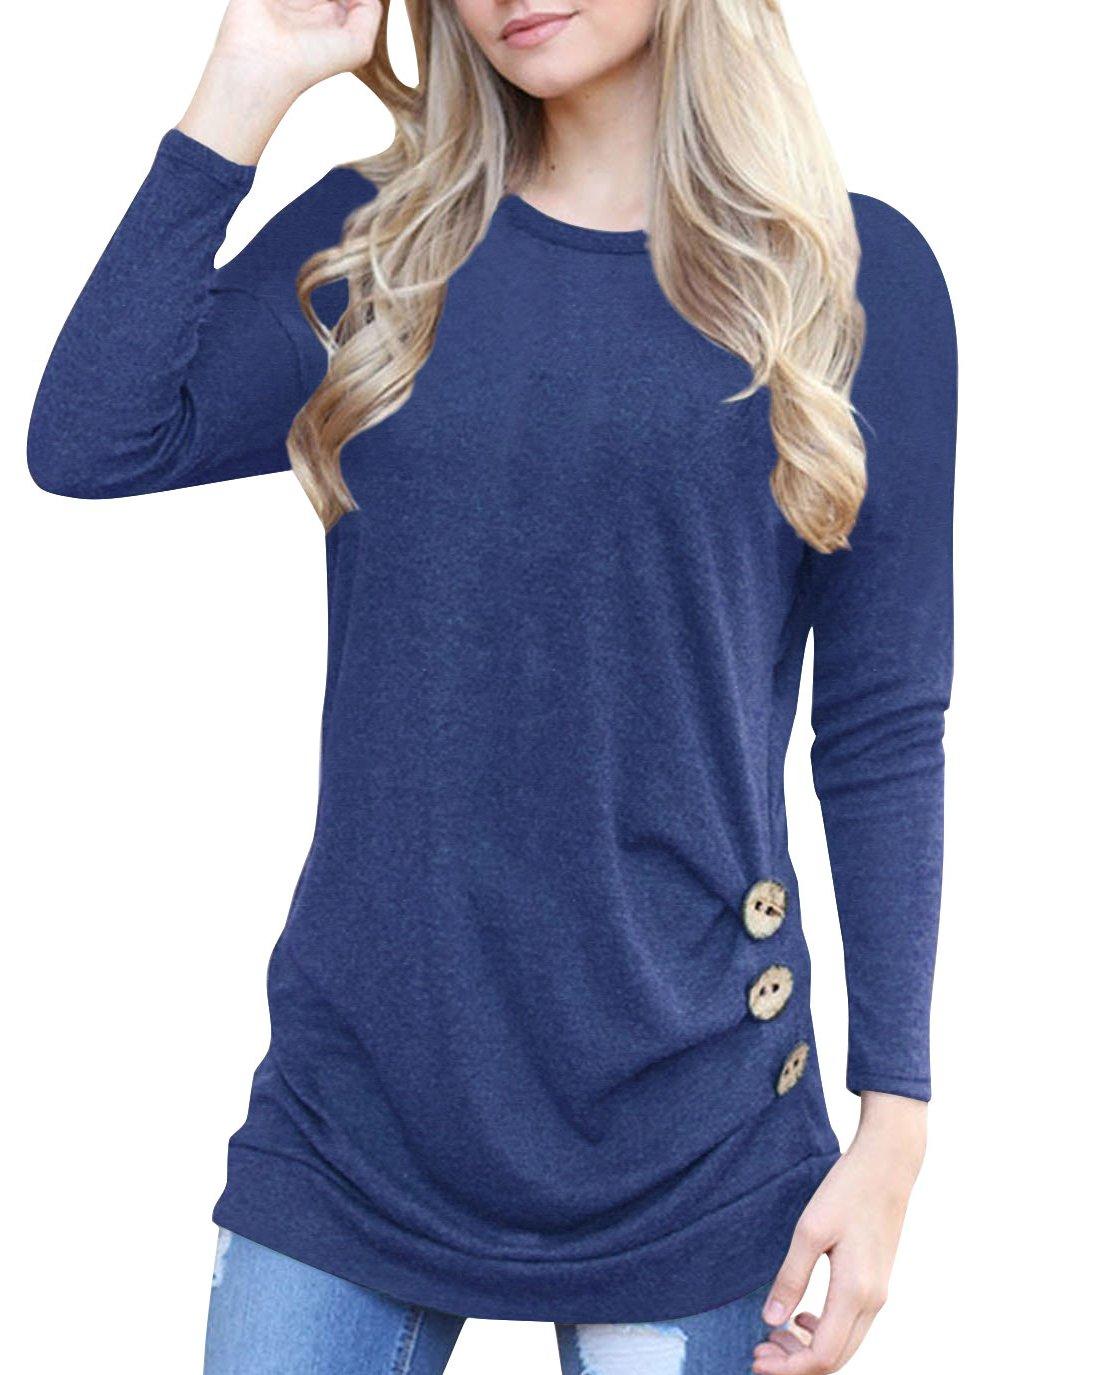 Doris Kids Women's Casual Tunic Top Sweatshirt Long Sleeve Blouse T-Shirt Button Decor Blue L